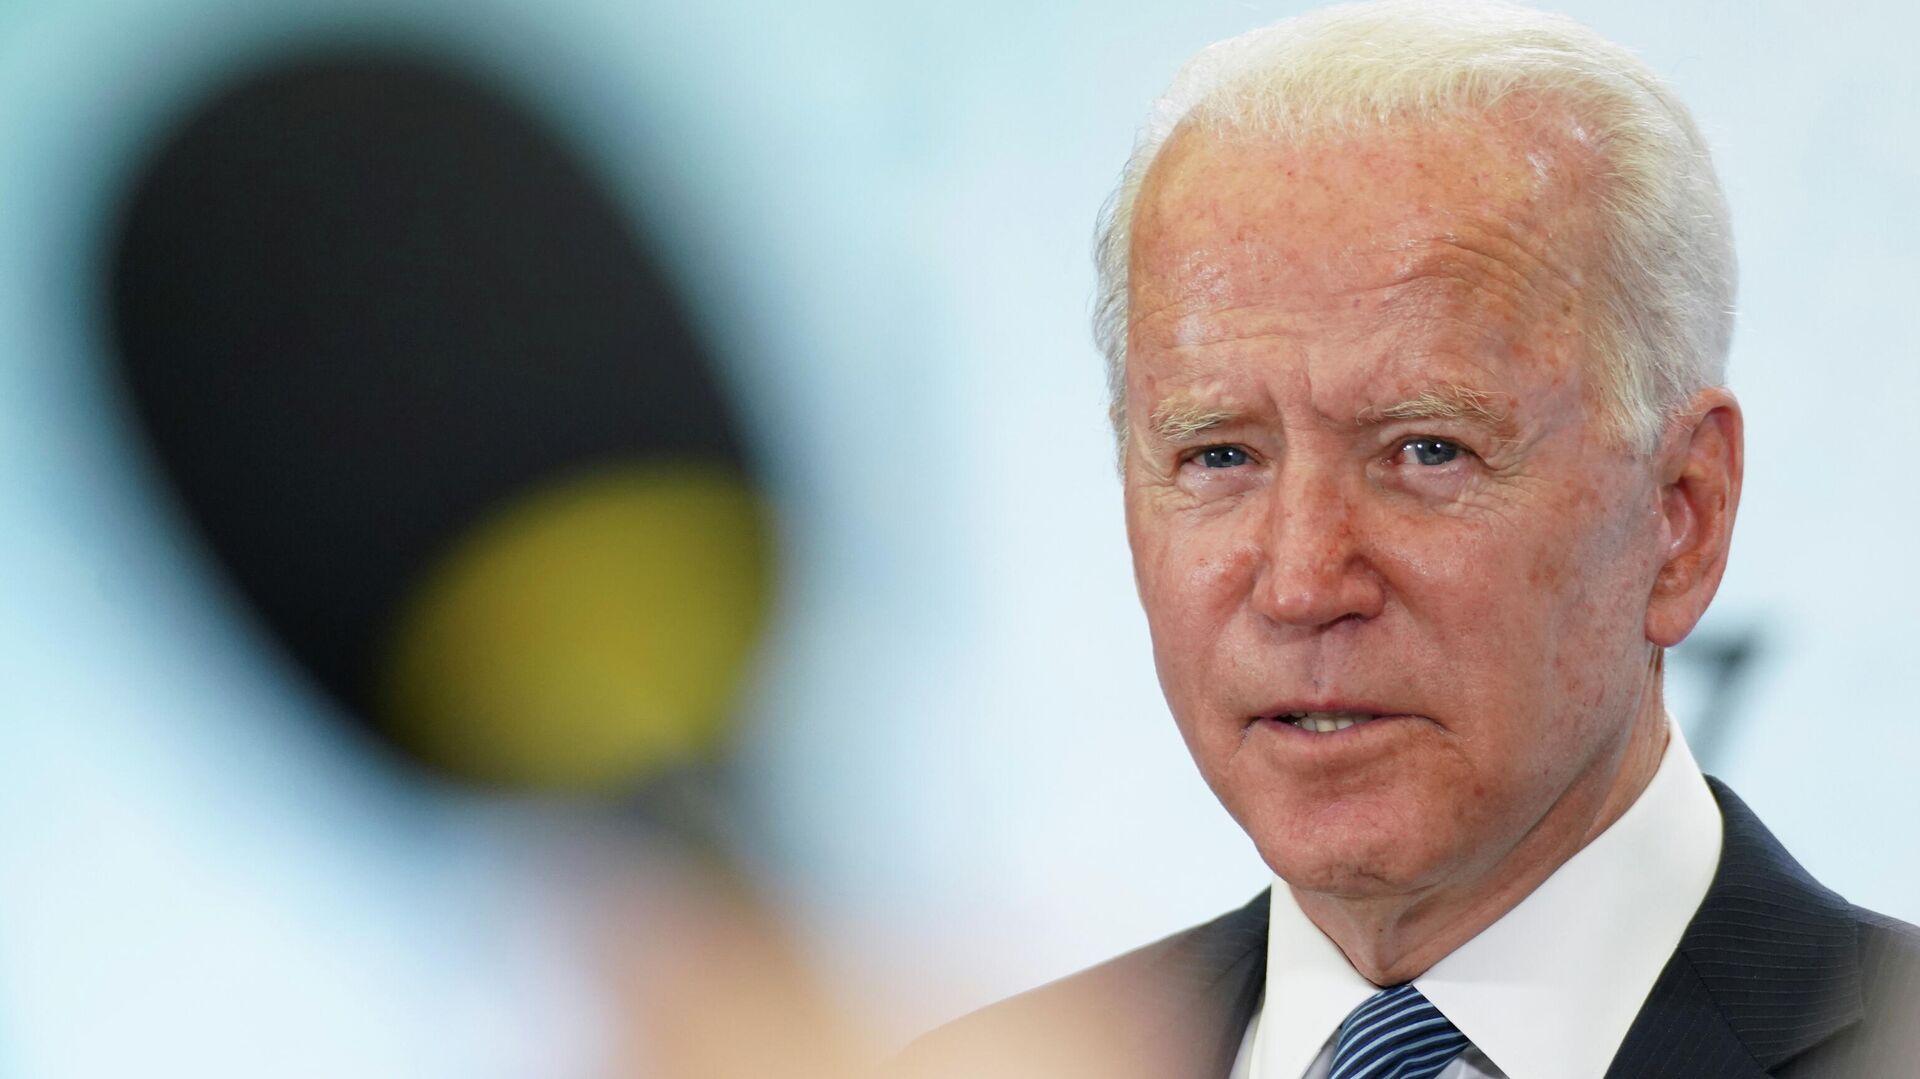 Joe Biden, presidente de EEUU - Sputnik Mundo, 1920, 13.06.2021